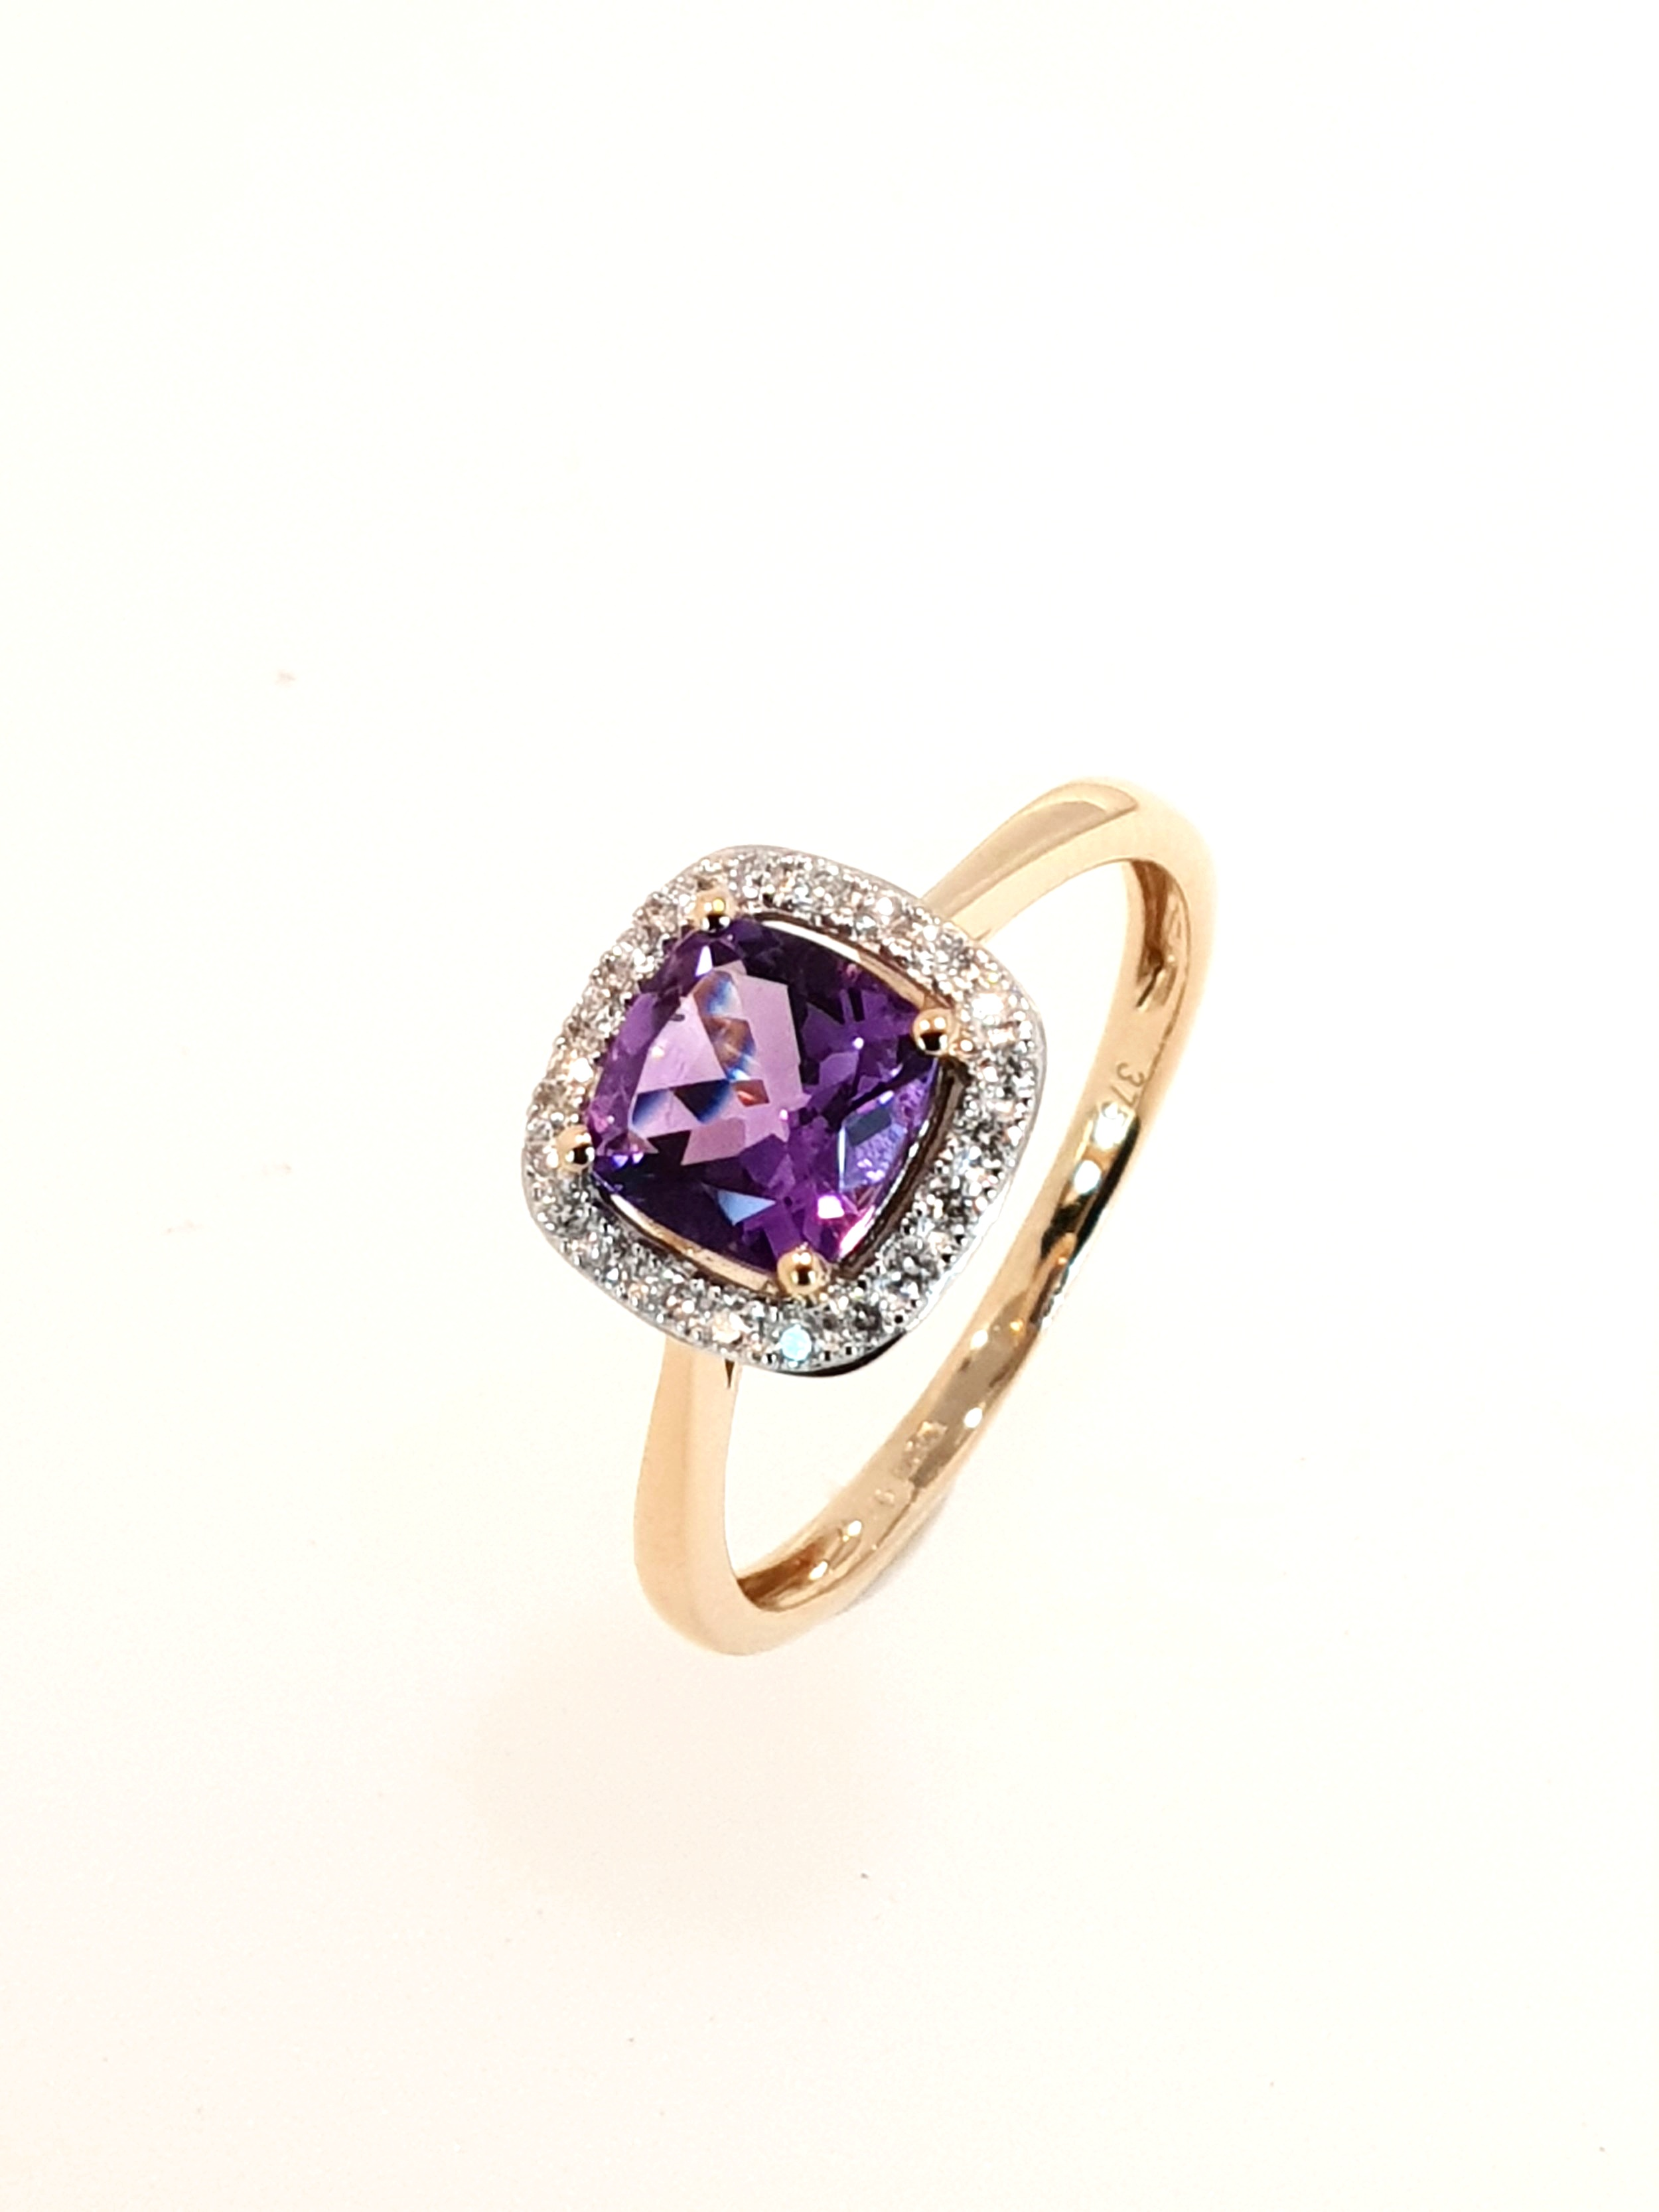 9ct Yellow Gold Amethyst(.95ct) & Diamond(.12ct) Ring  Stock Code: G1968  £630